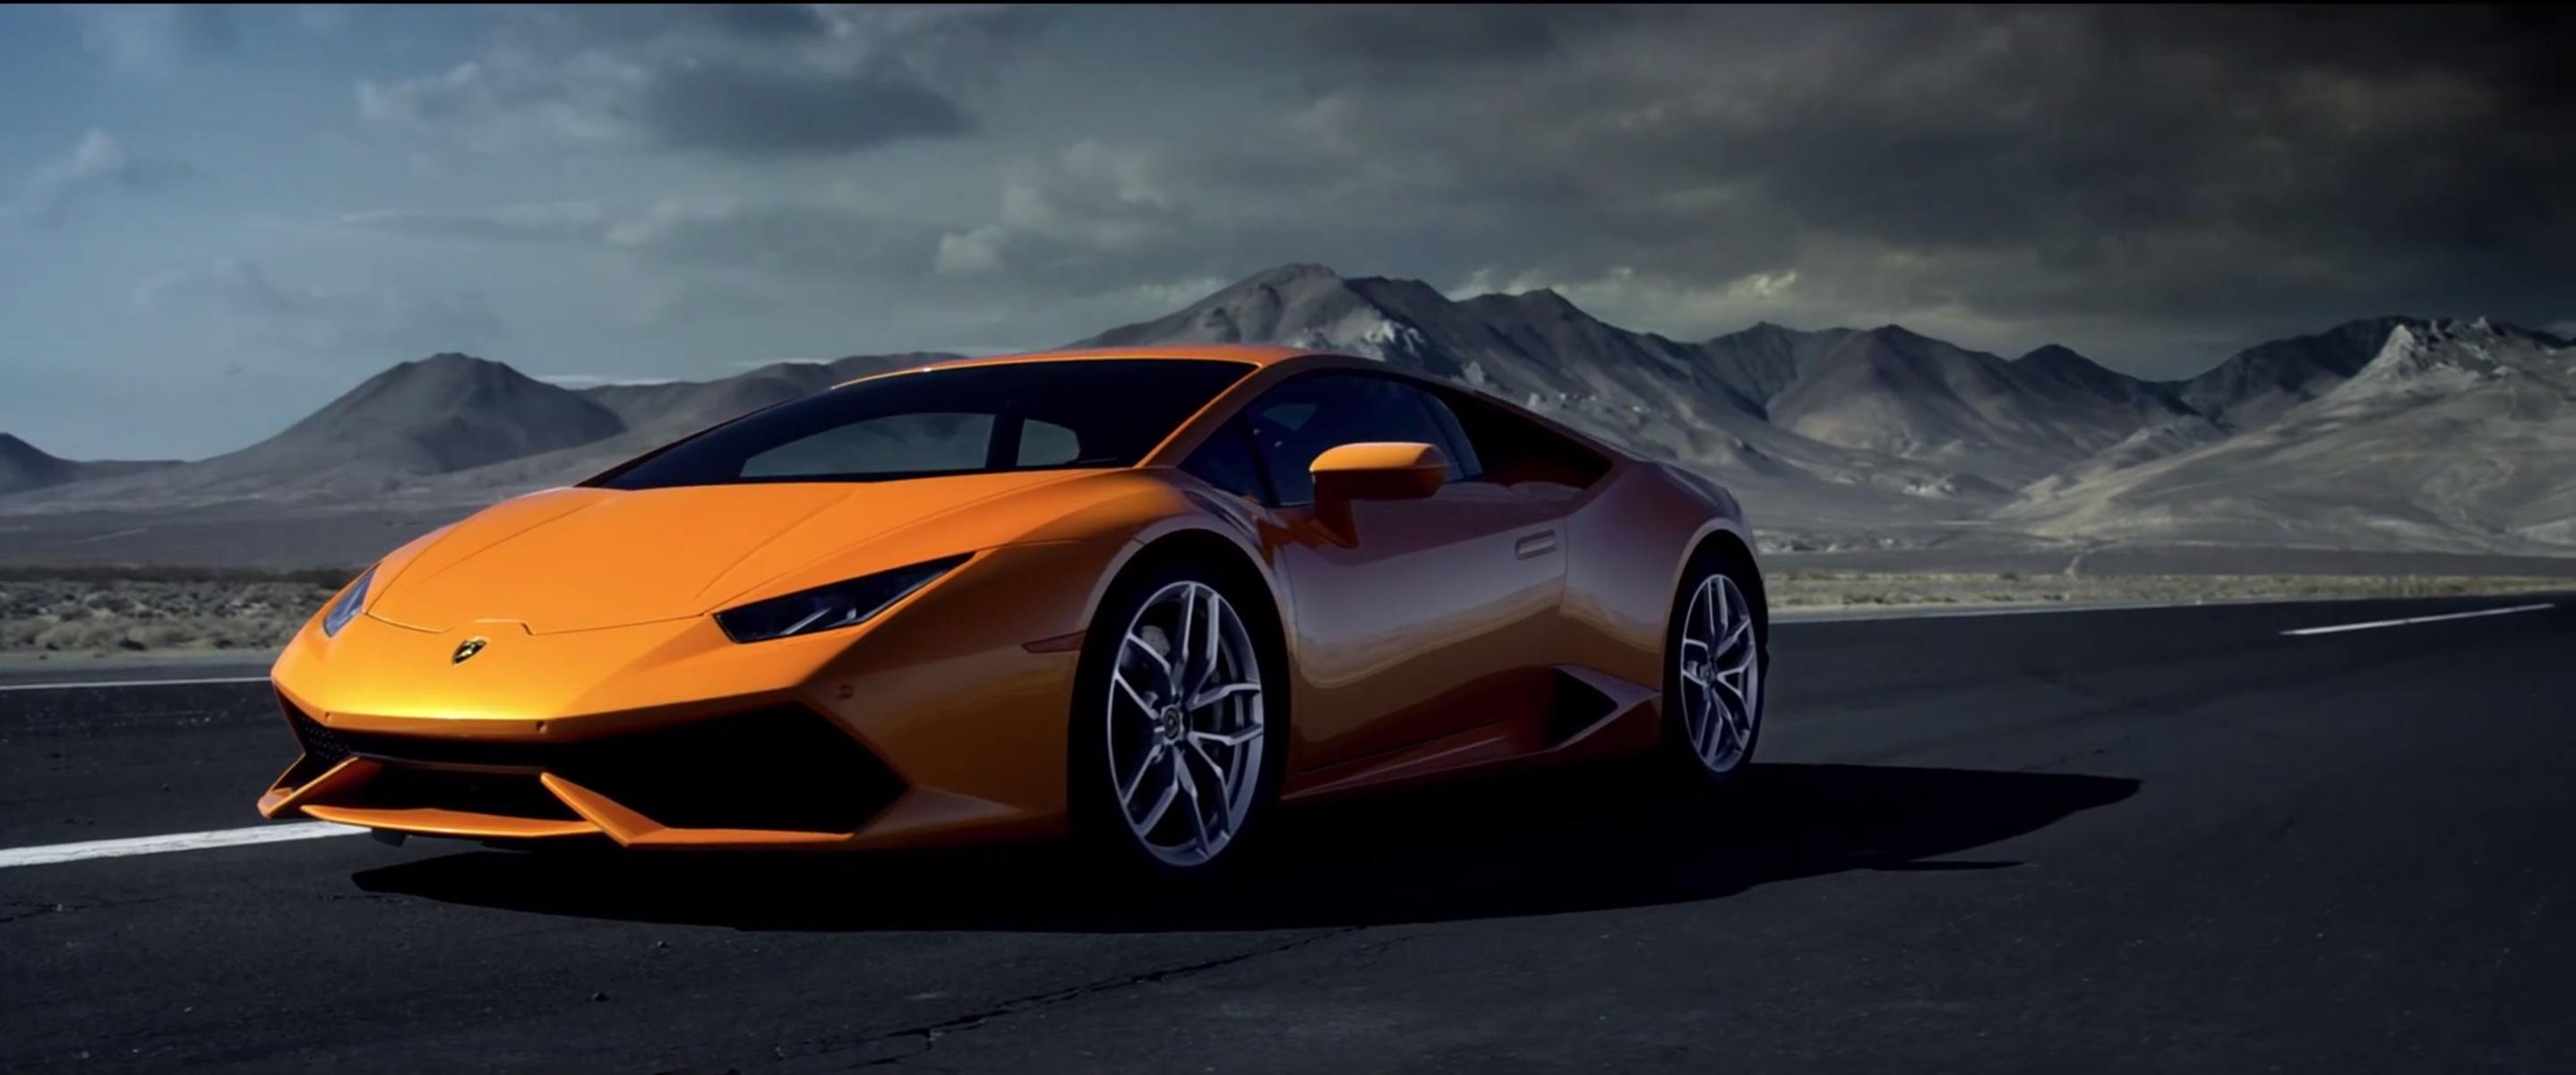 lamborghini huracan best 2014 top 2014 hd wallpaper wallpaper cars - Lamborghini Huracan Hd Wallpapers 1080p